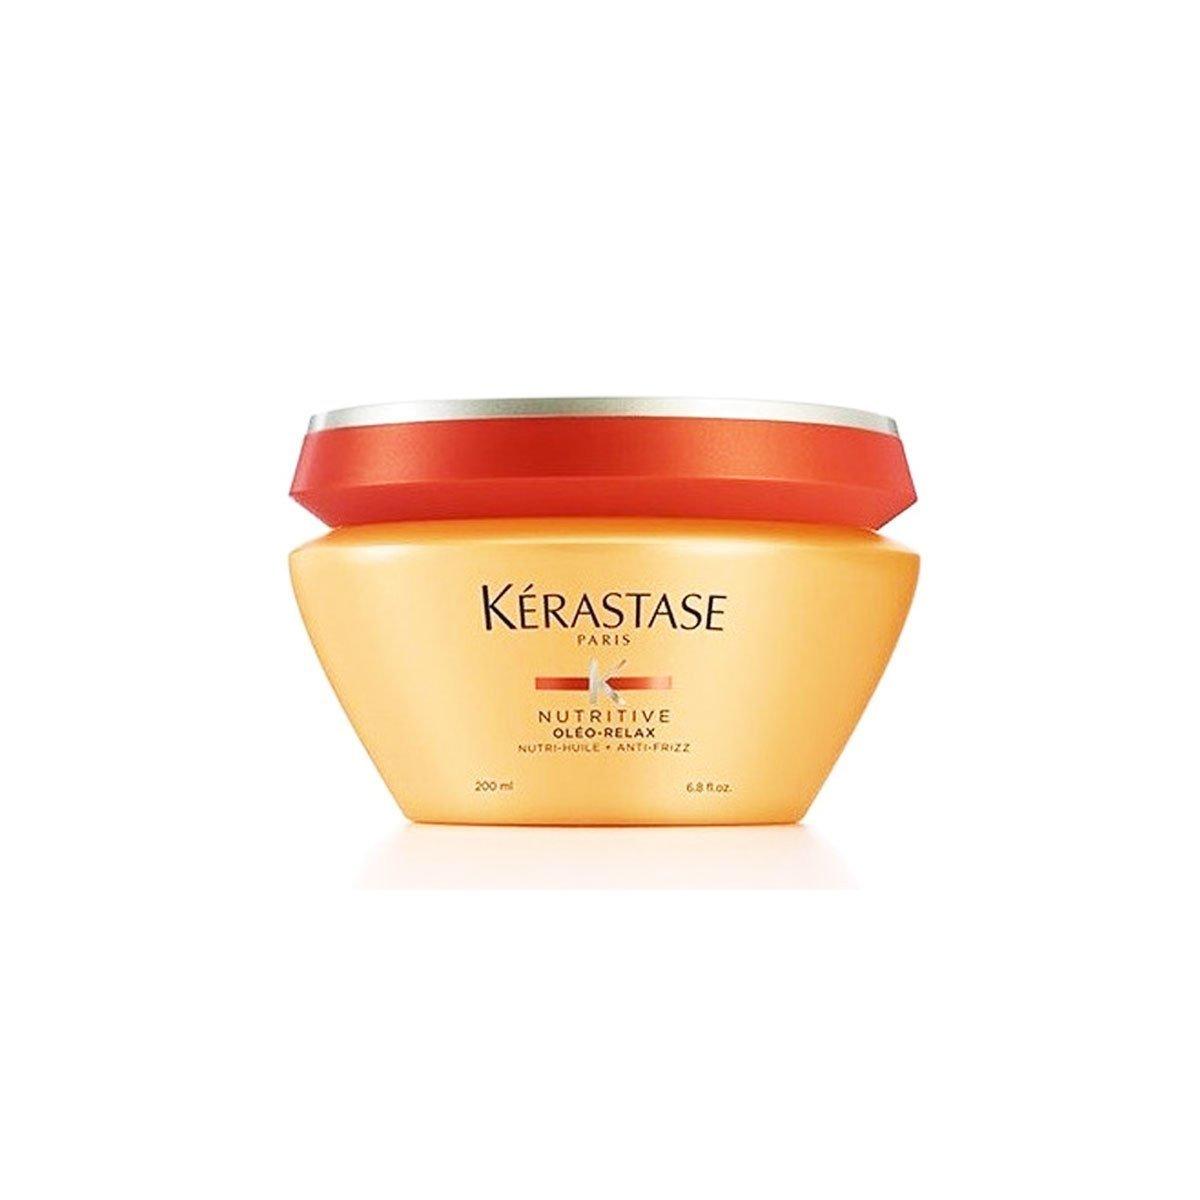 Kerastase Nutritive Oleo-Relax Masque, 6.76 Ounce Mainspring America Inc. DBA Direct Cosmetics 3474636382668